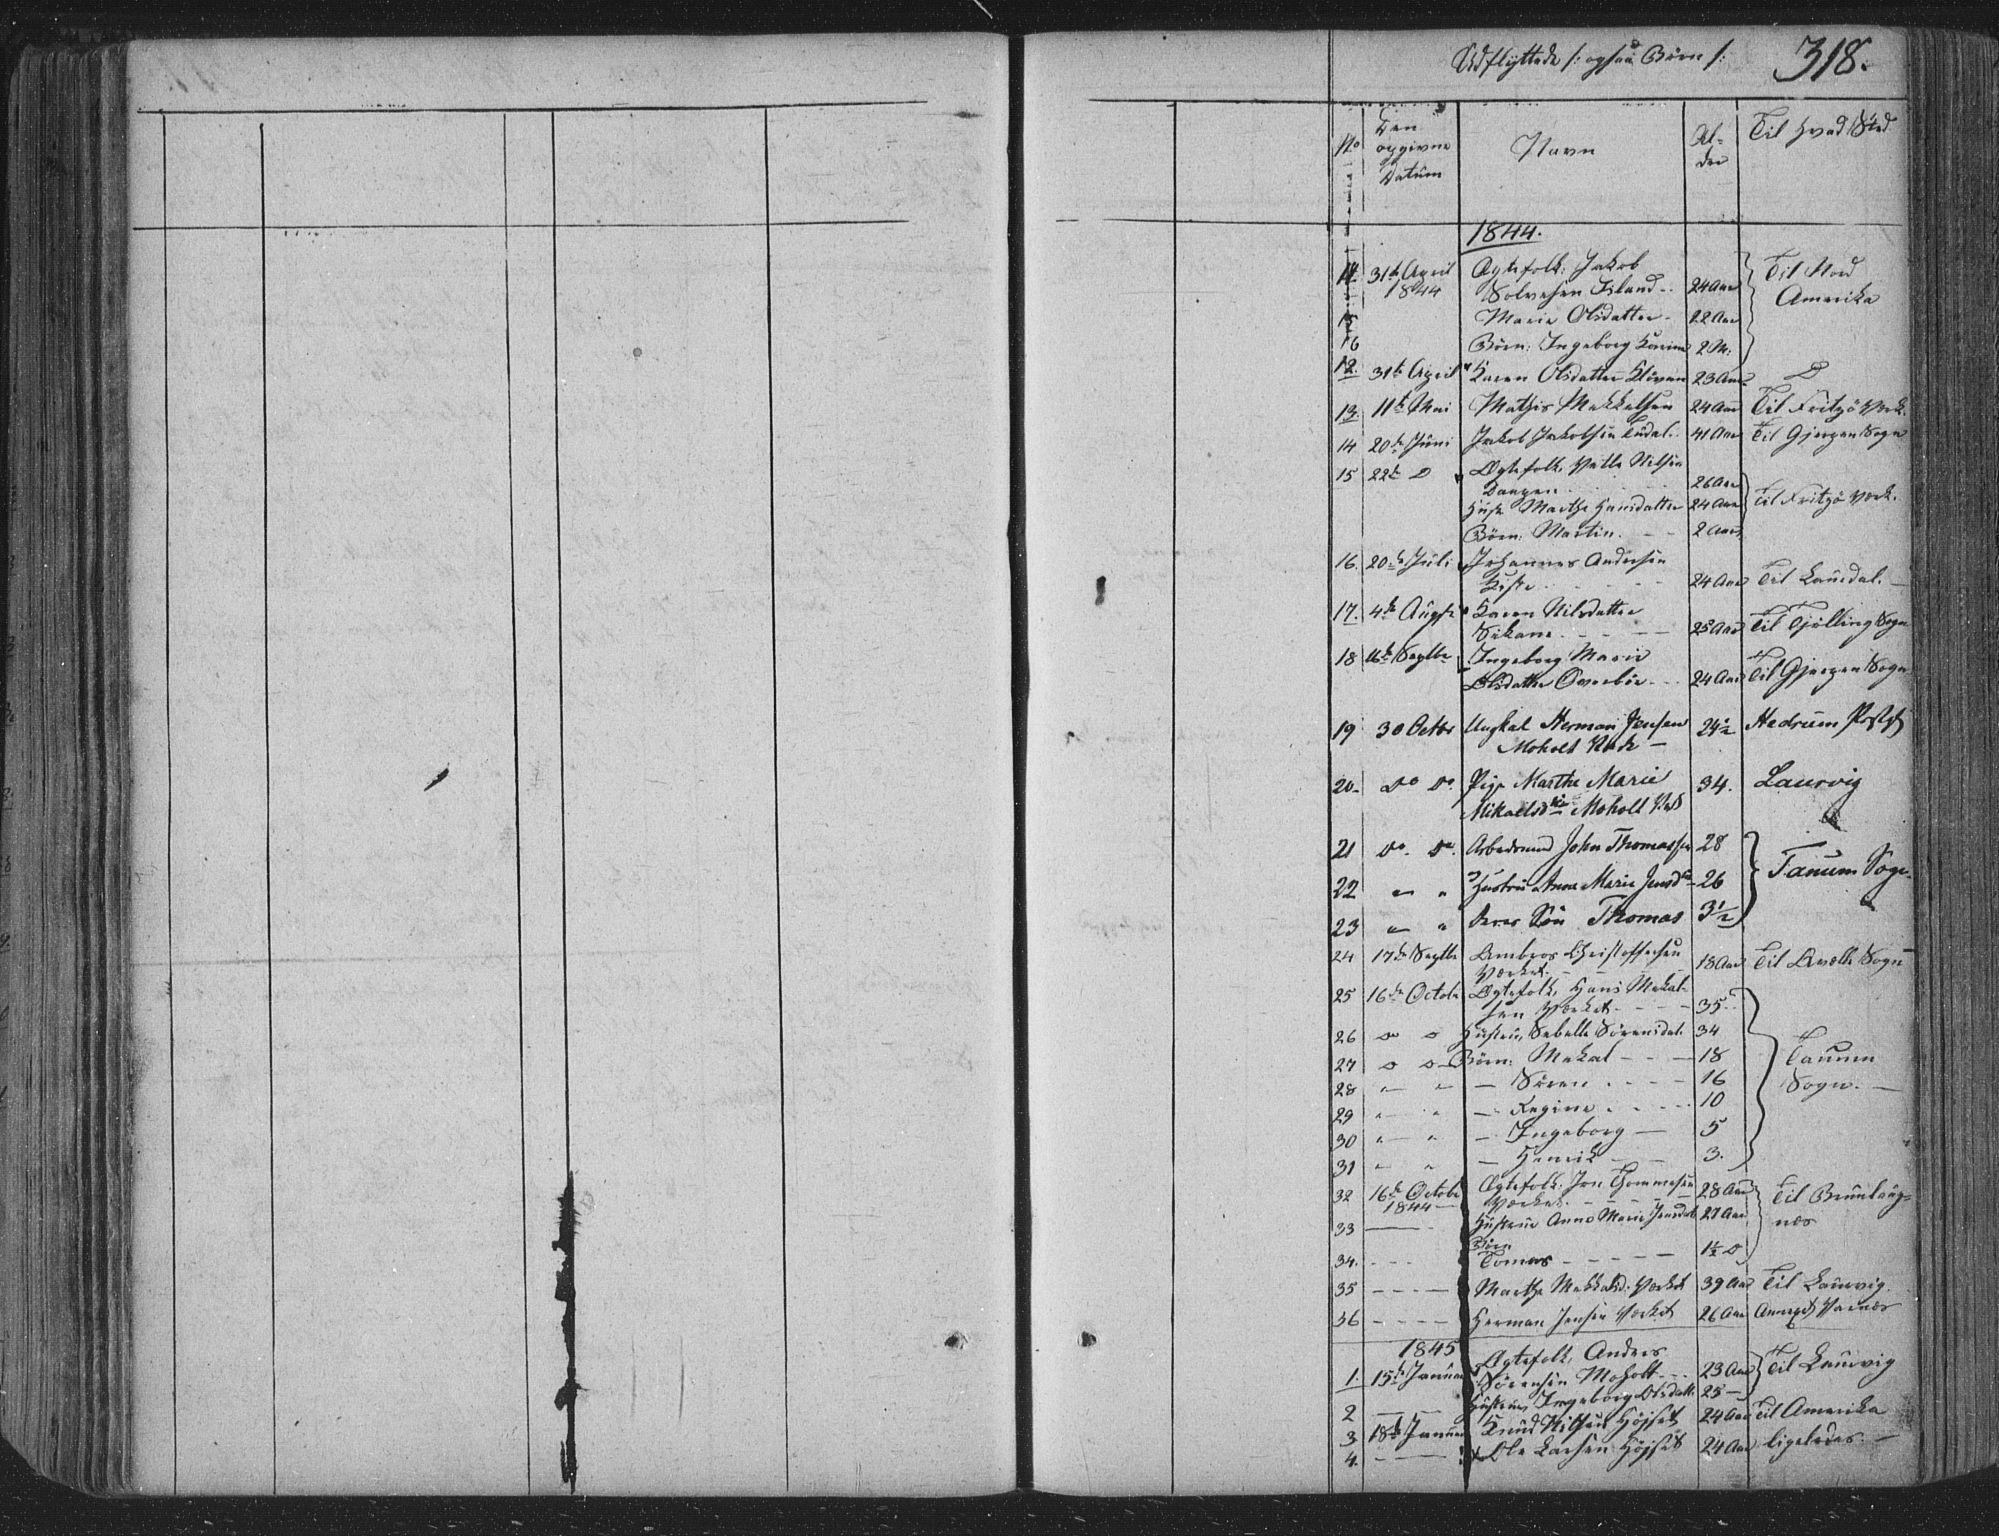 SAKO, Siljan kirkebøker, F/Fa/L0001: Parish register (official) no. 1, 1831-1870, p. 318